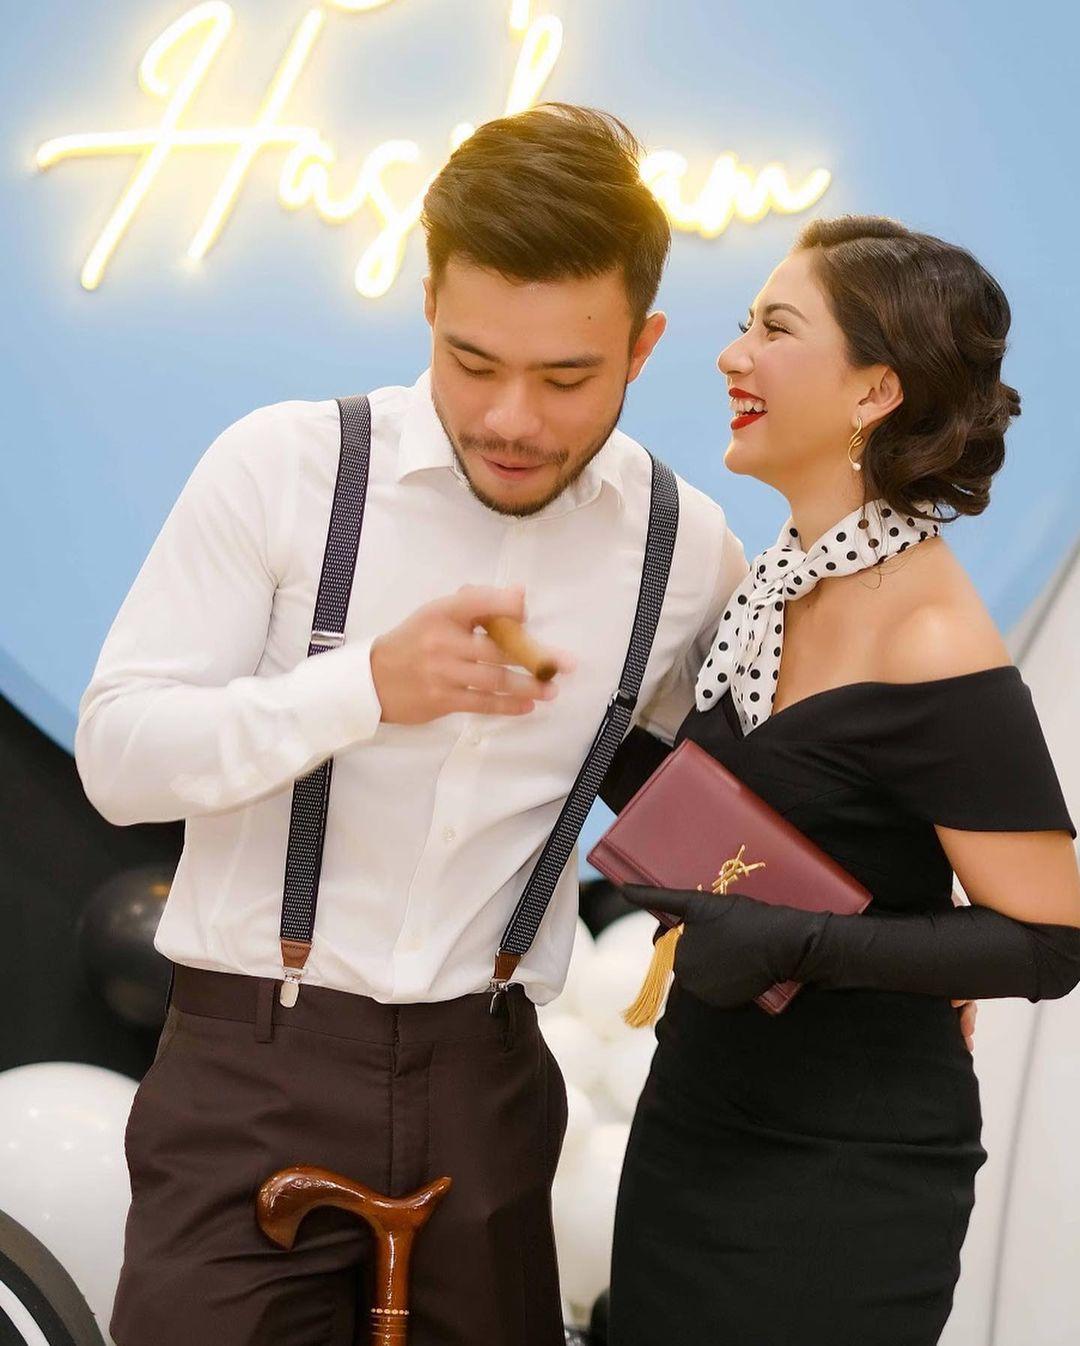 Bikin Baper, 7 Potret Romantis Jessica Mila dan Yakup Hasibuan - Foto 2